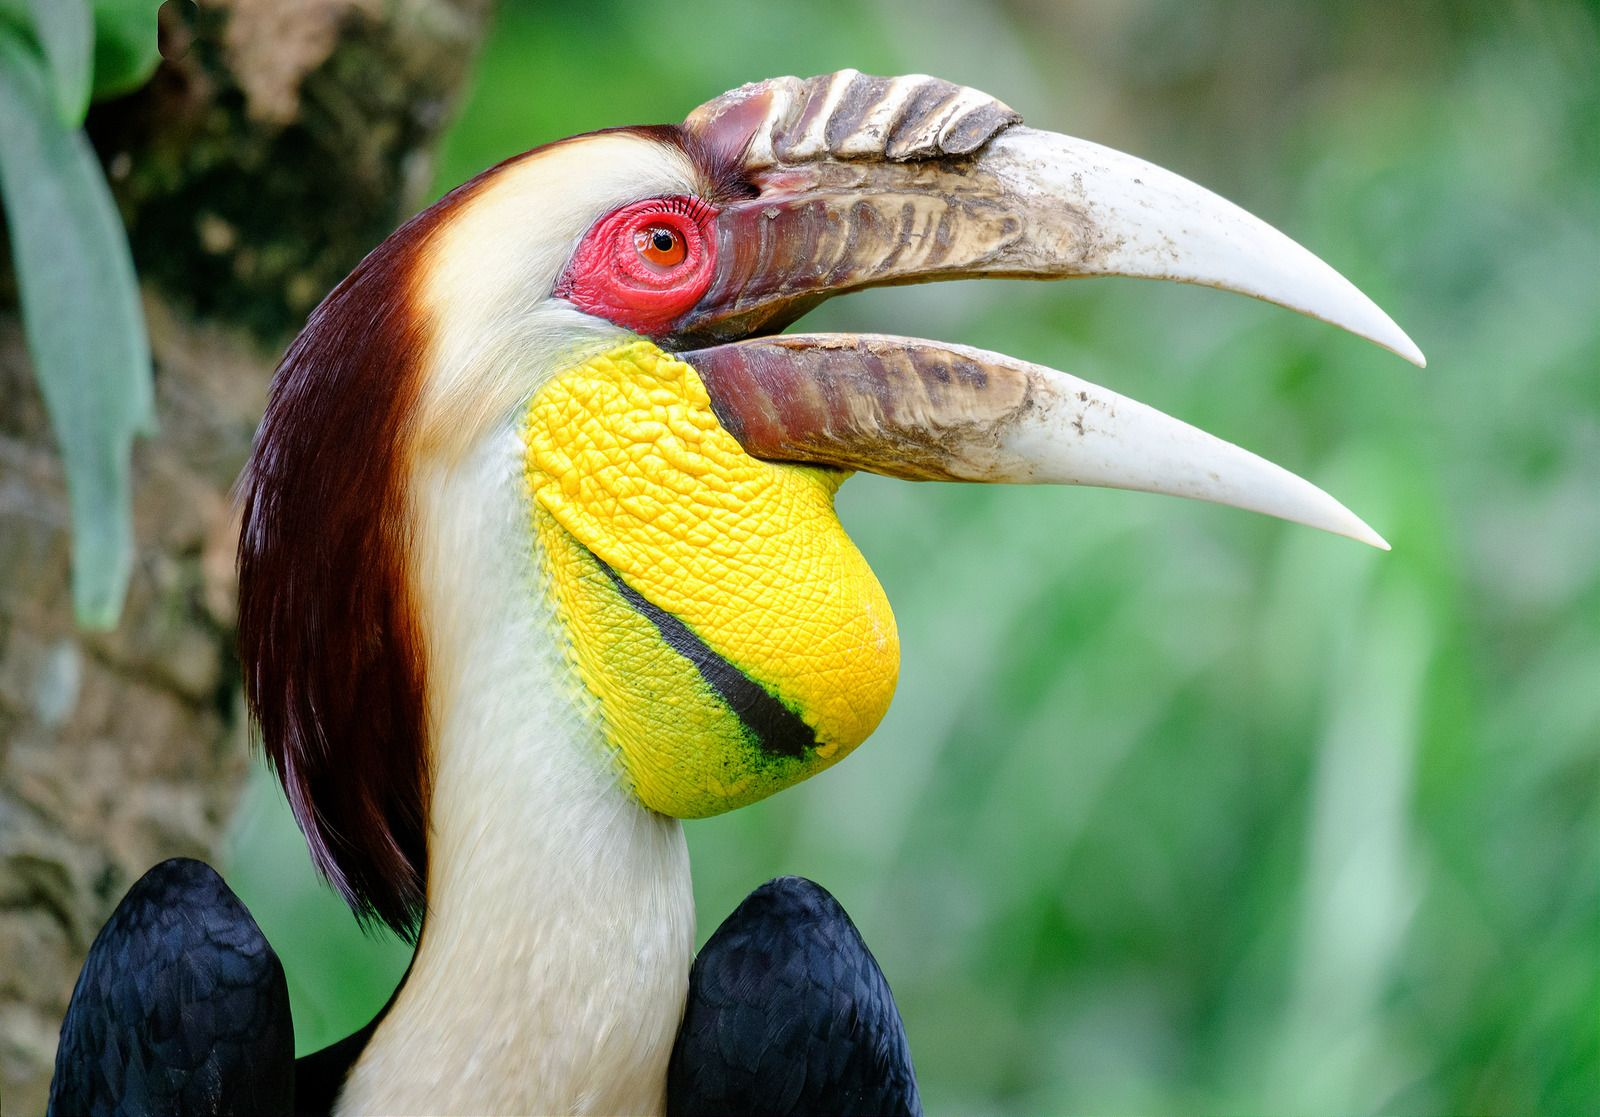 Male Wreathed Hornbill (Aceros undulates), Bali zoo